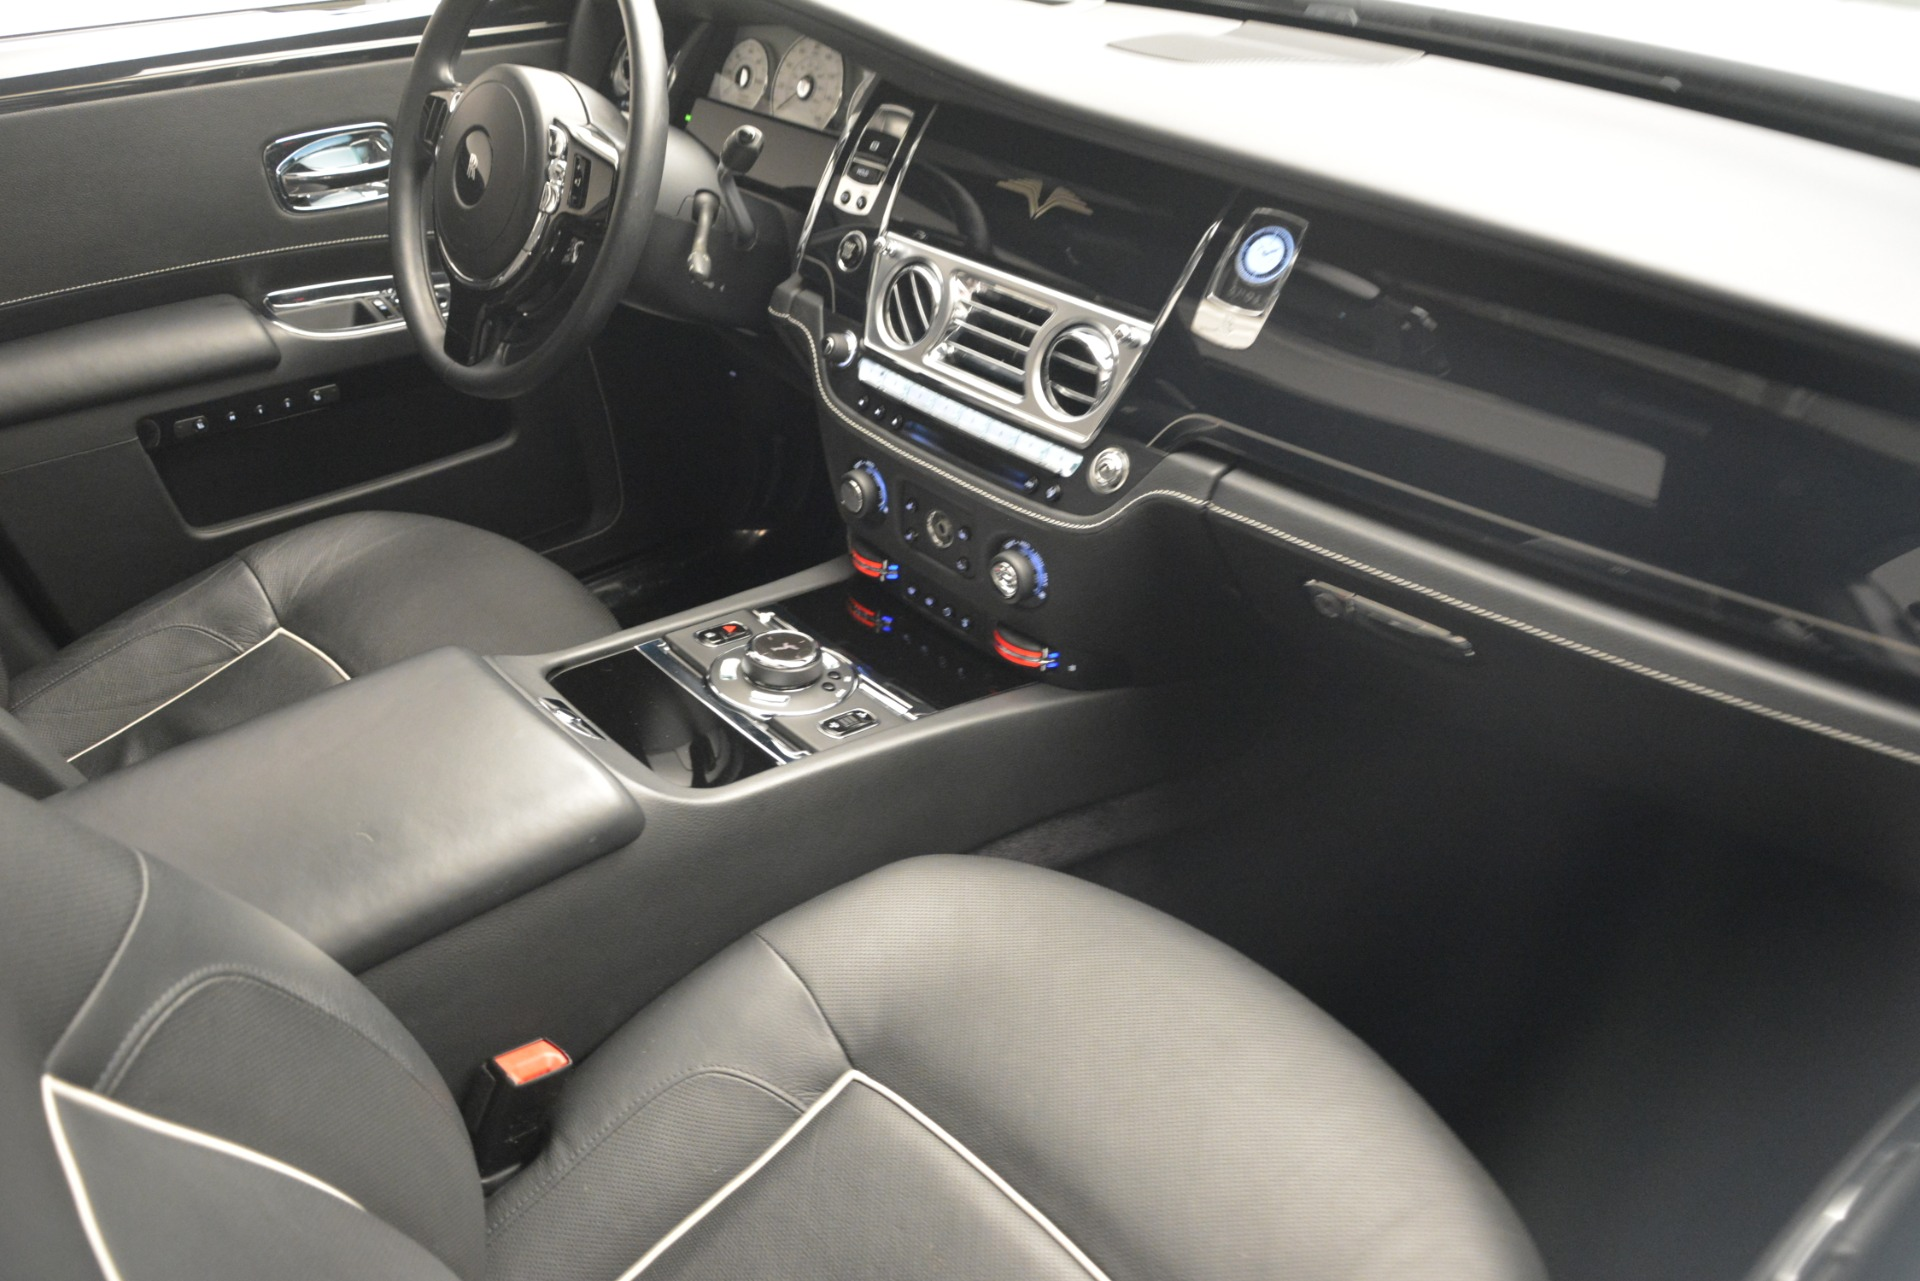 Used 2014 Rolls-Royce Ghost V-Spec For Sale In Westport, CT 2989_p29